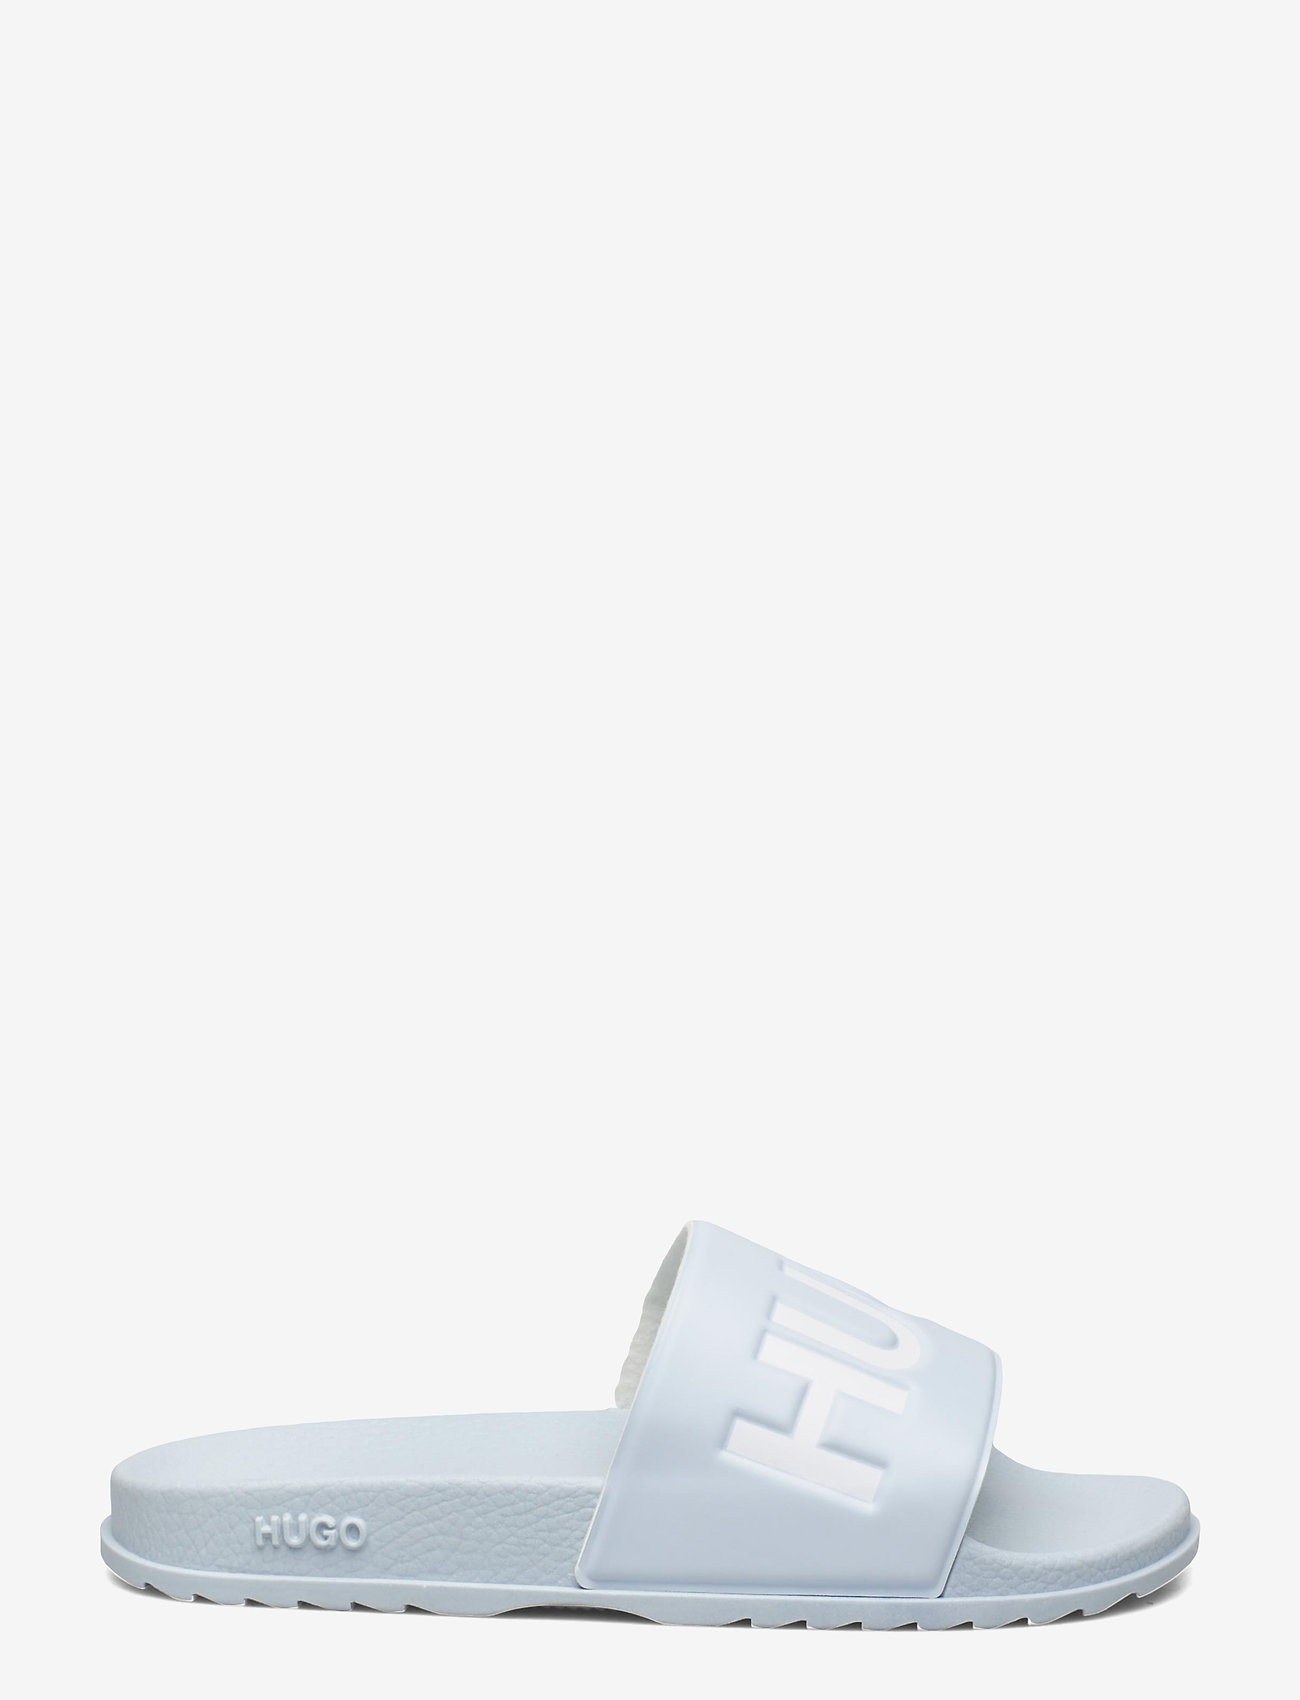 HUGO - Match_Slid_rblg - sandales de bain - light/pastel blue - 1